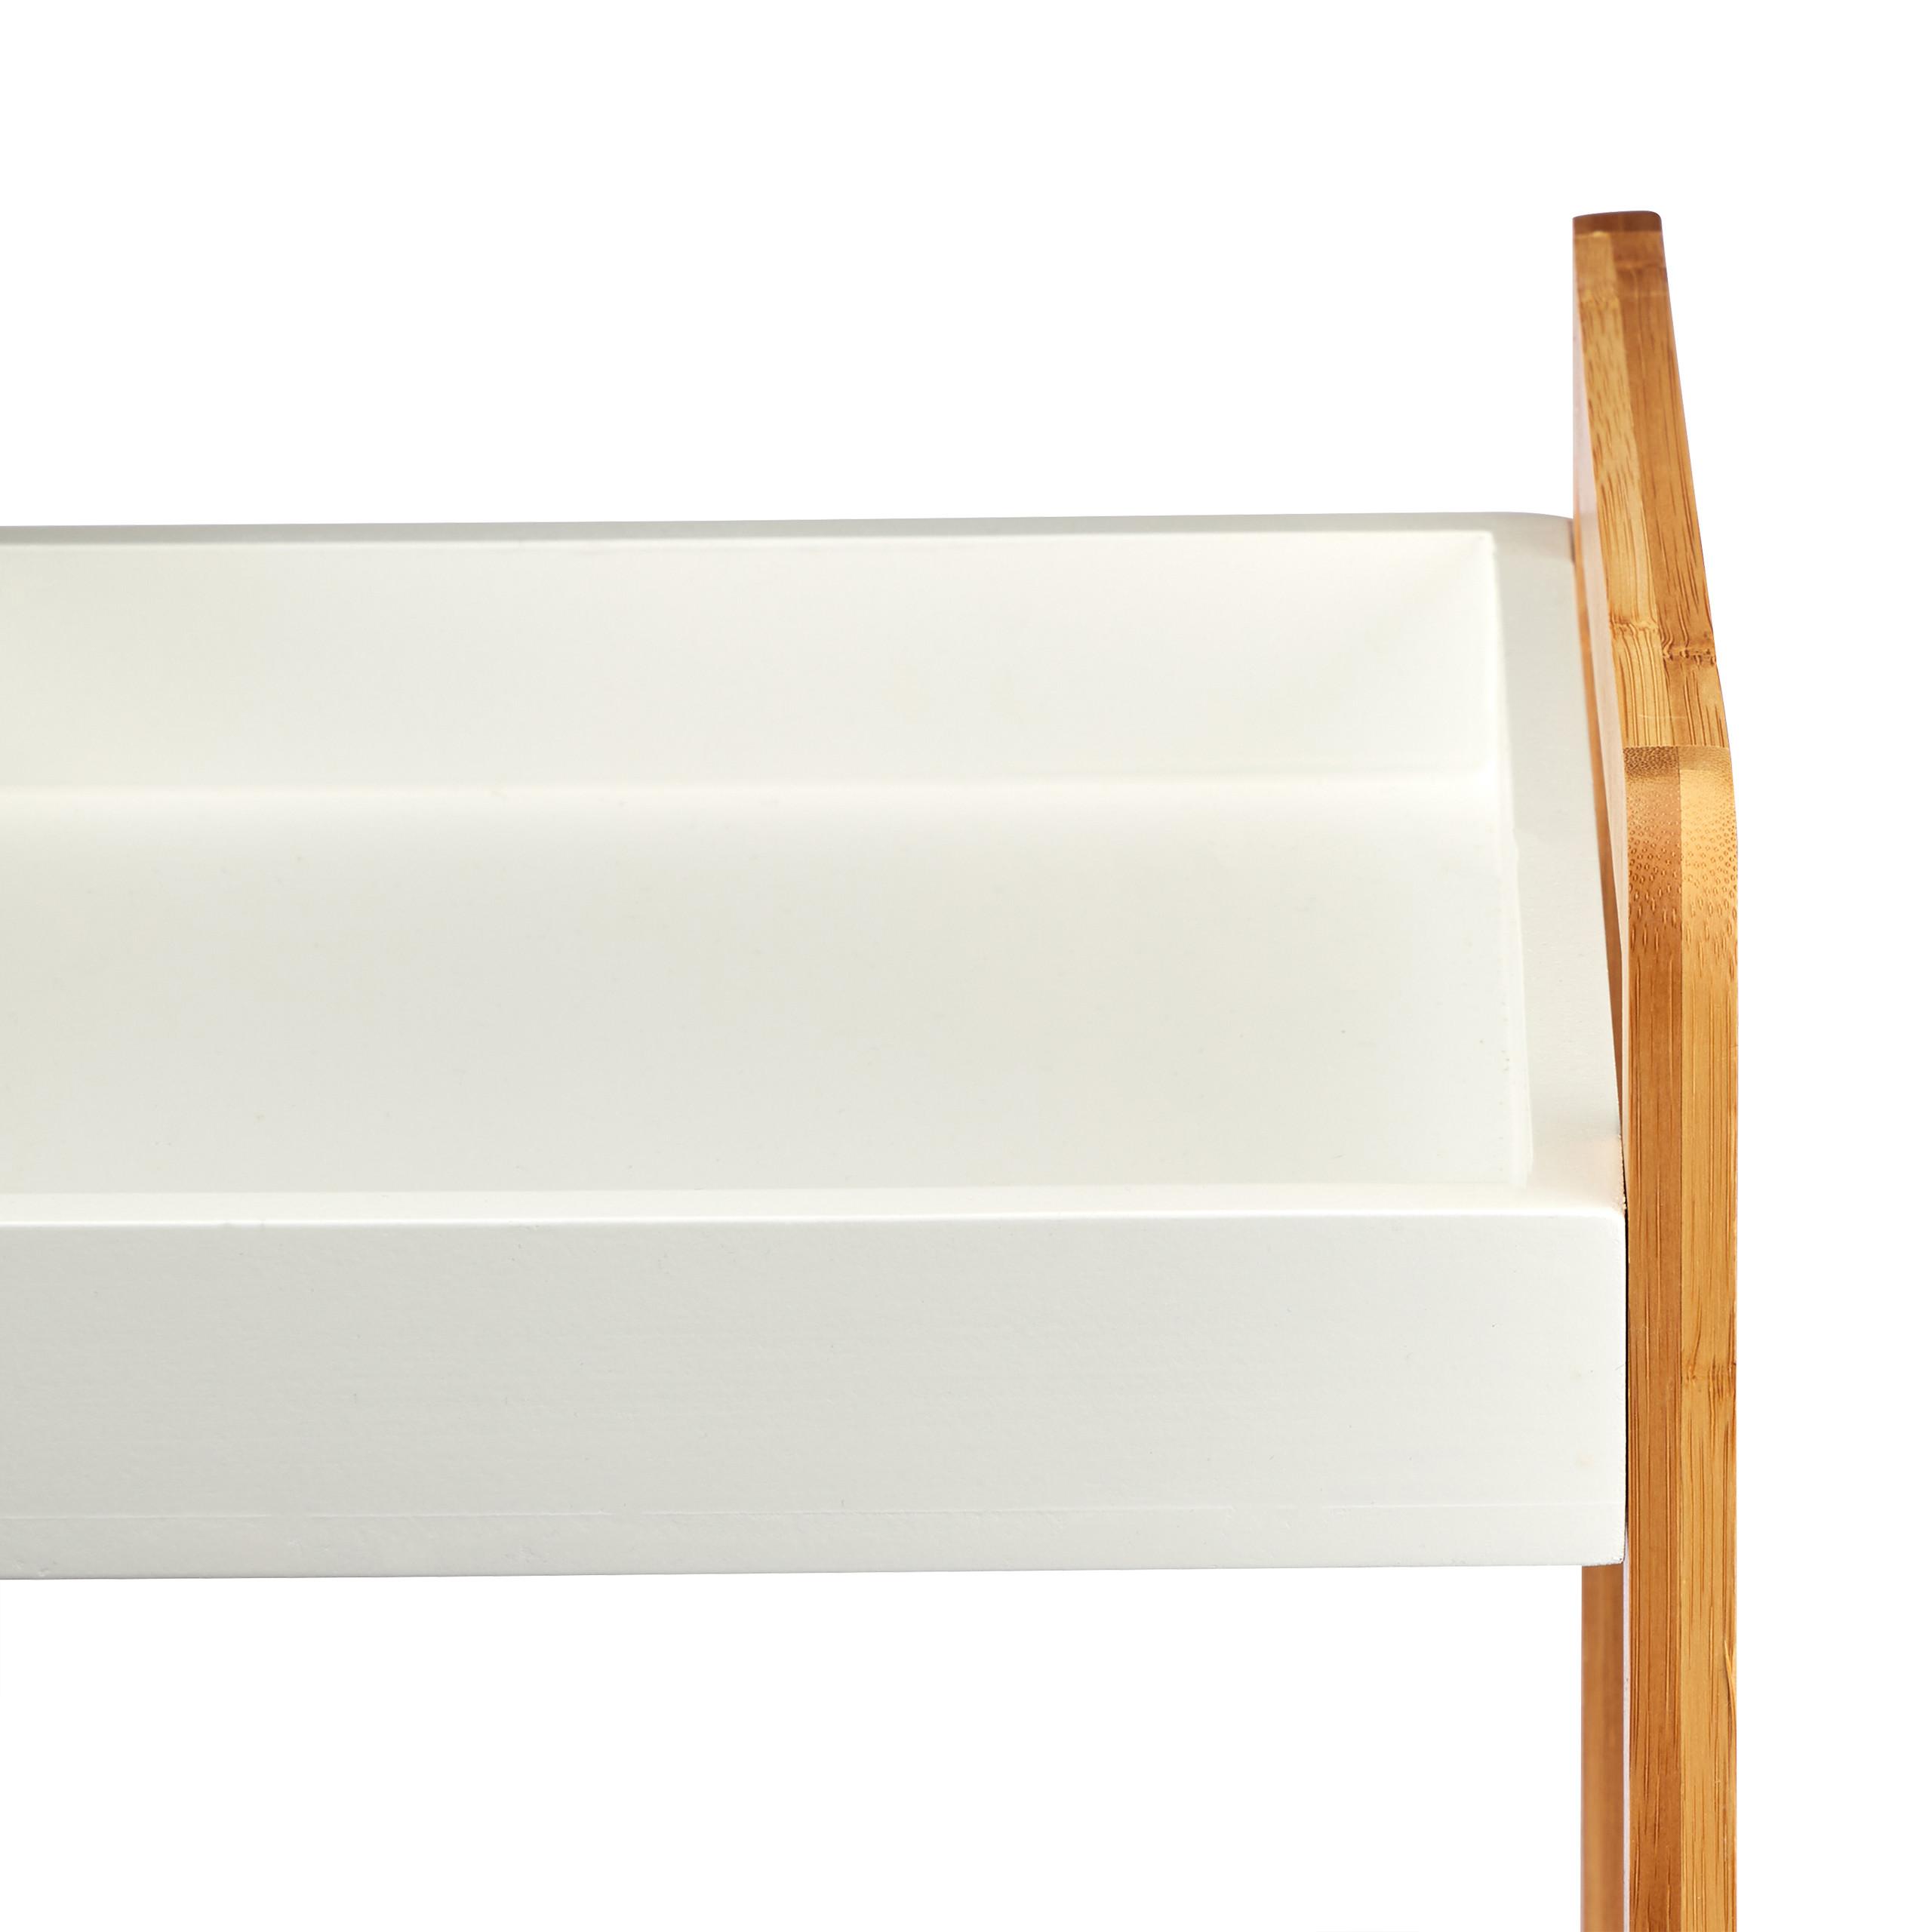 Badregal Bambus Standregal Küchenregal Badezimmerregal Bambusregal Ablagefächer